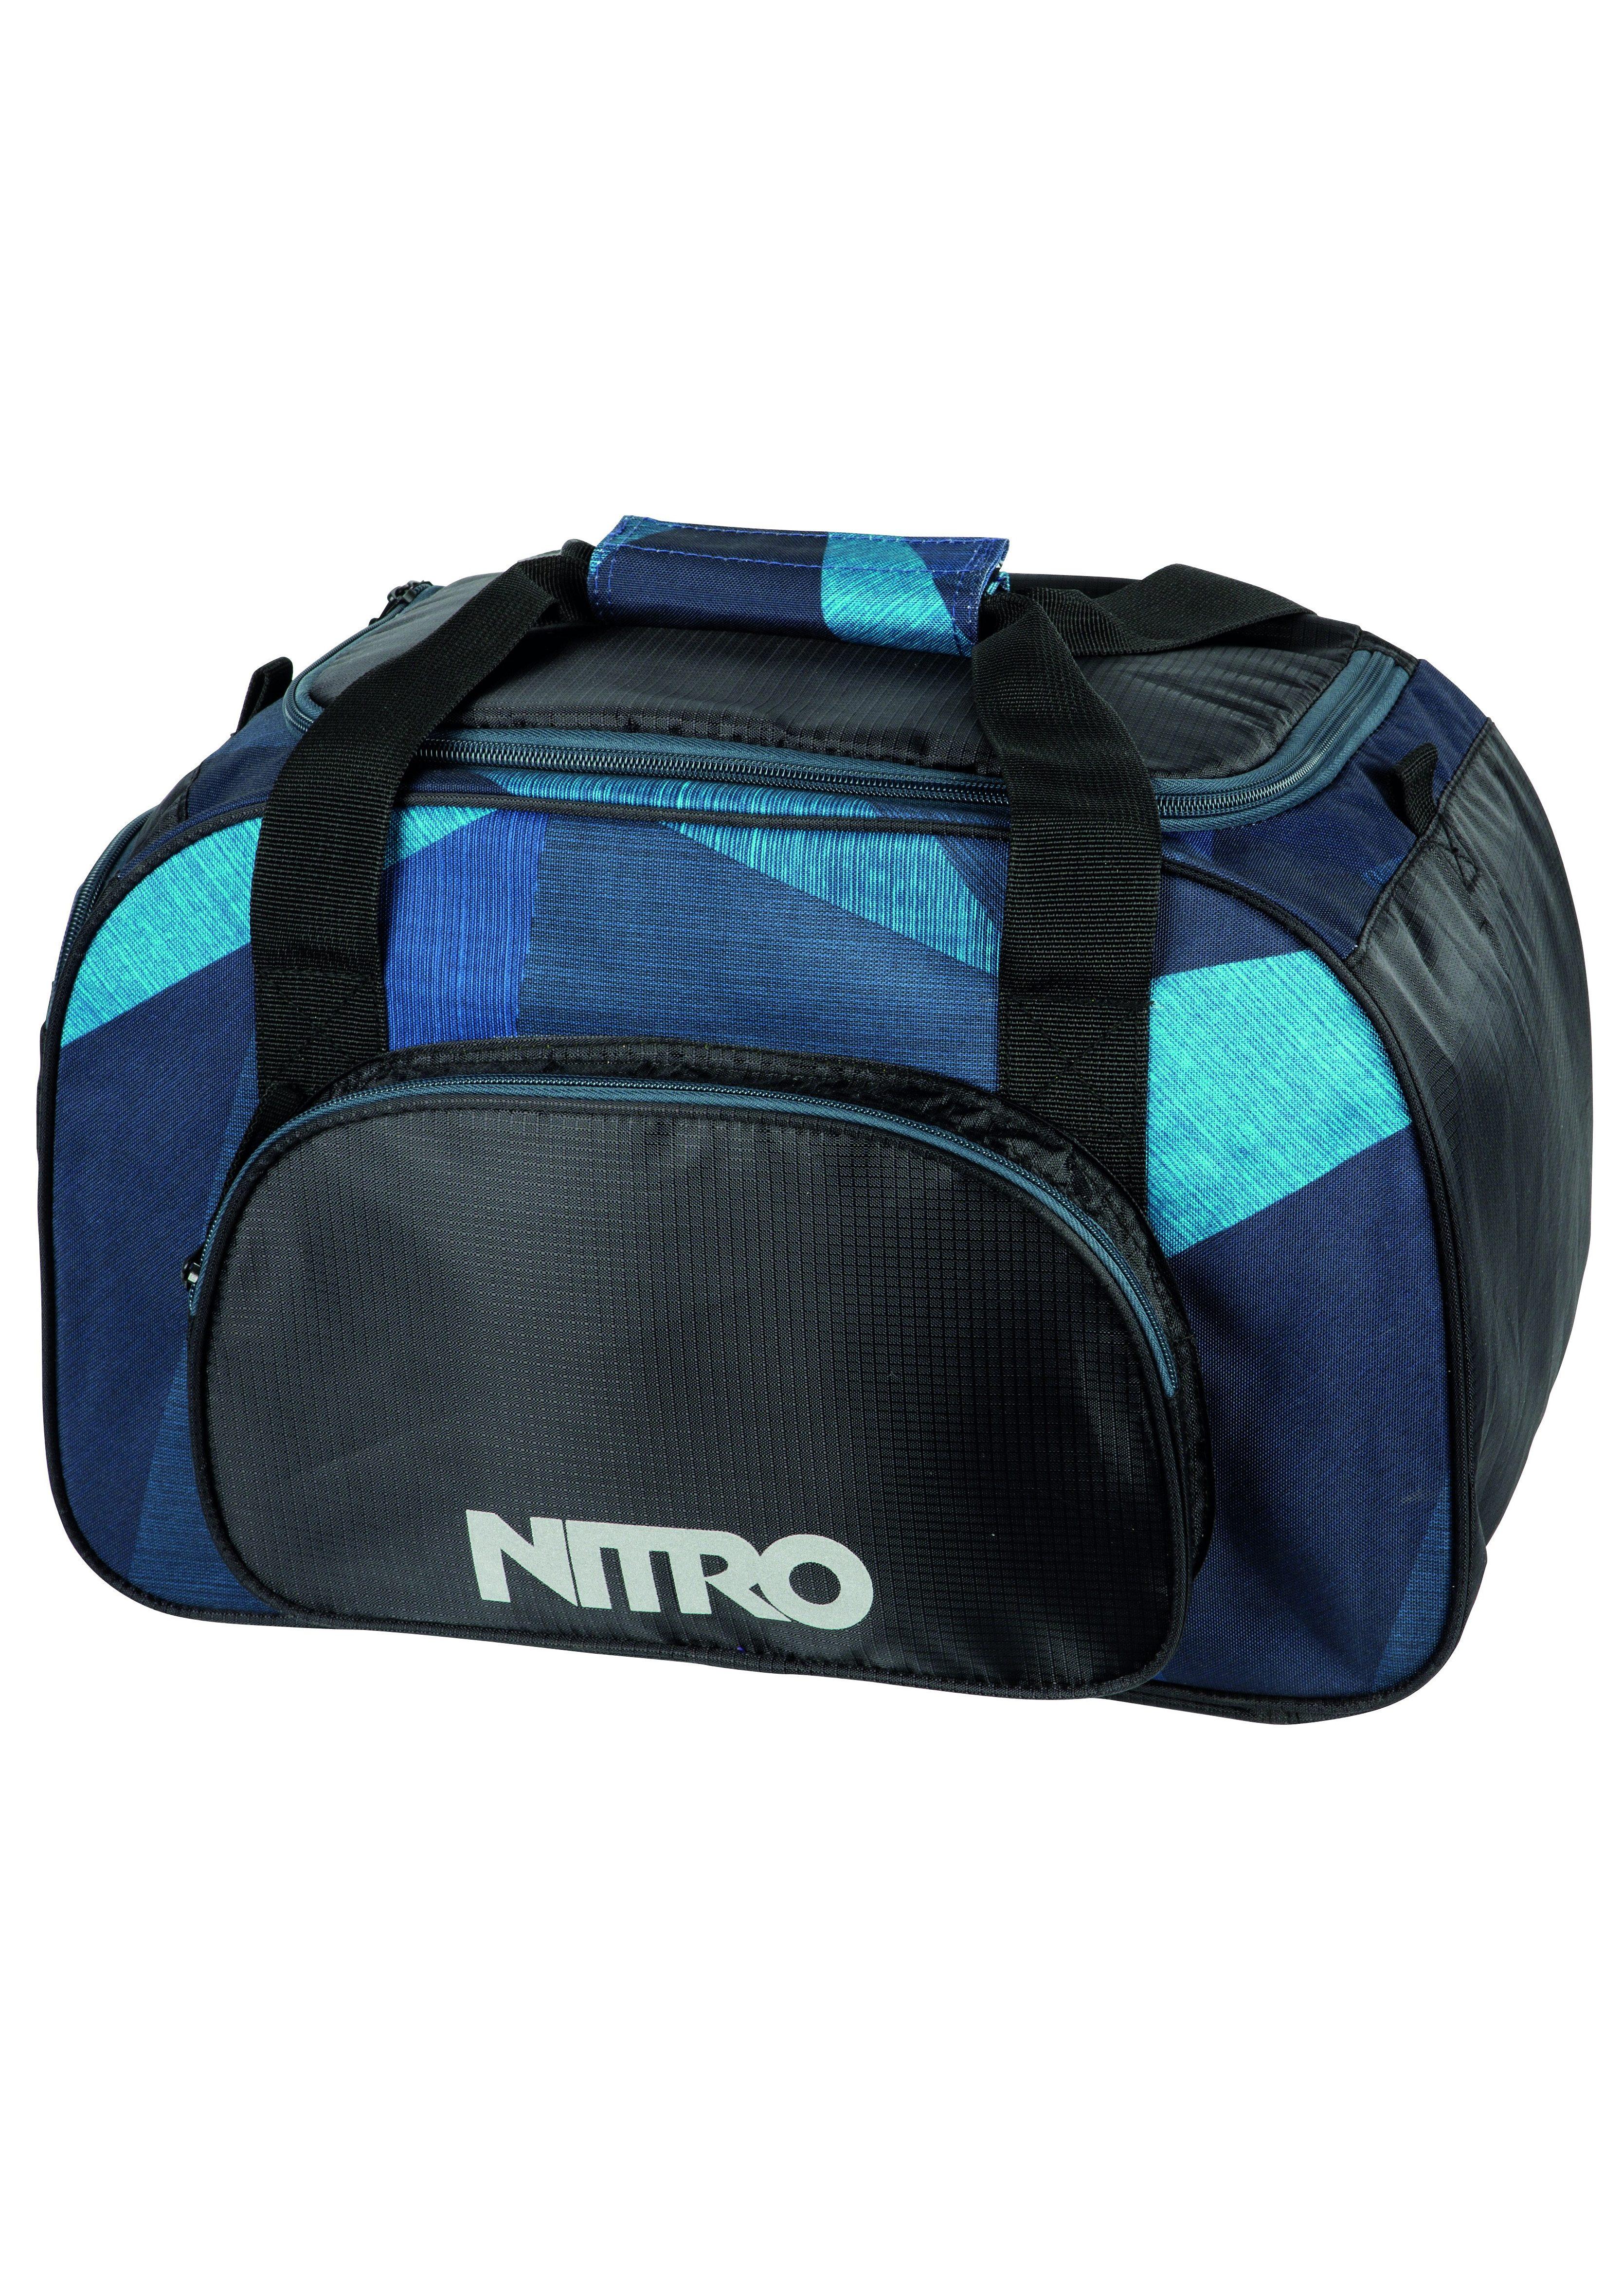 Nitro Reisetasche, »Duffle Bag XS - Fragments Blue«